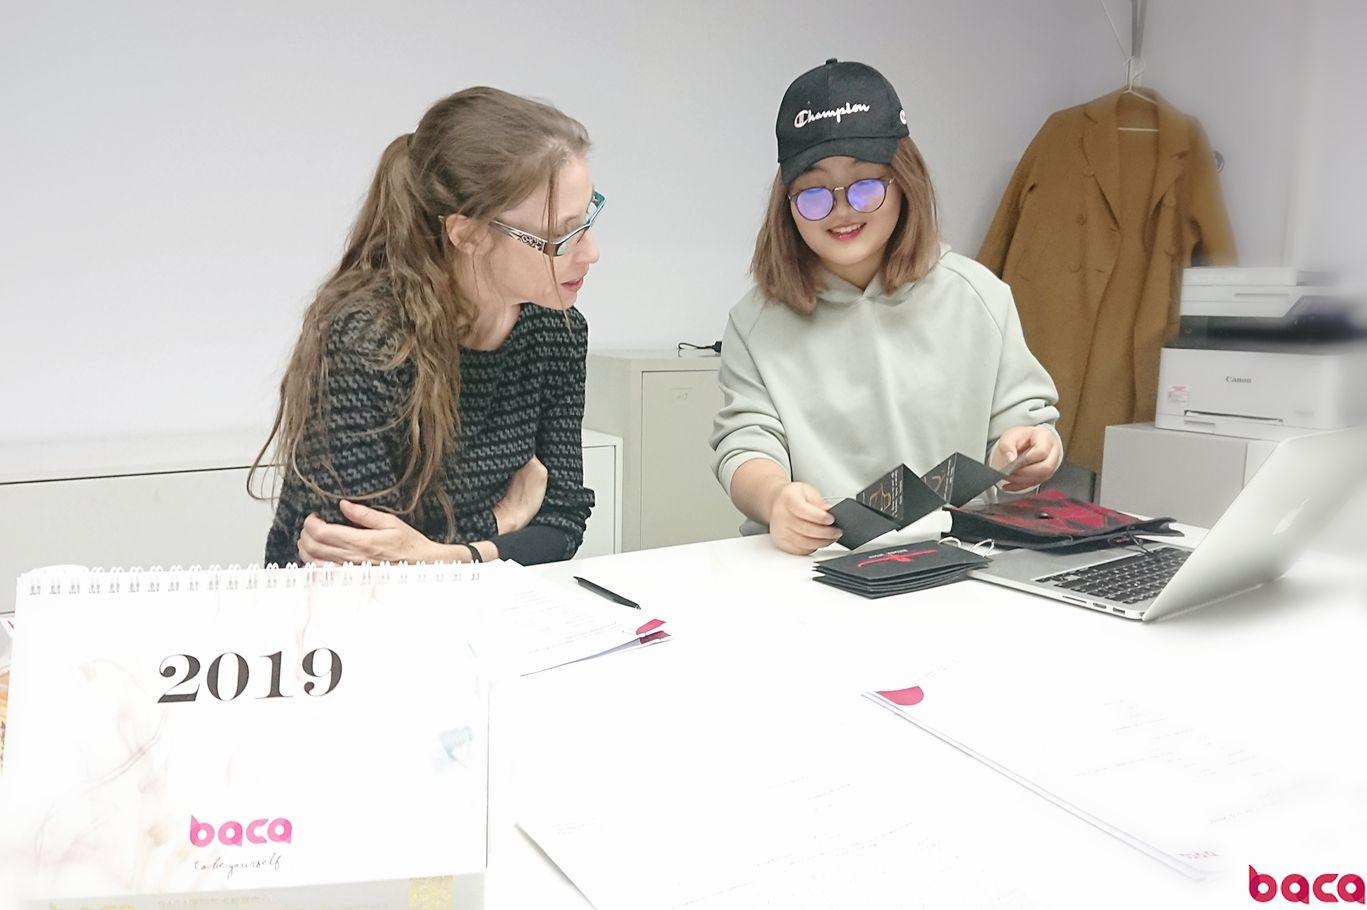 BACA艺术设计预科喜获威敏预录取!| OFFER收割季